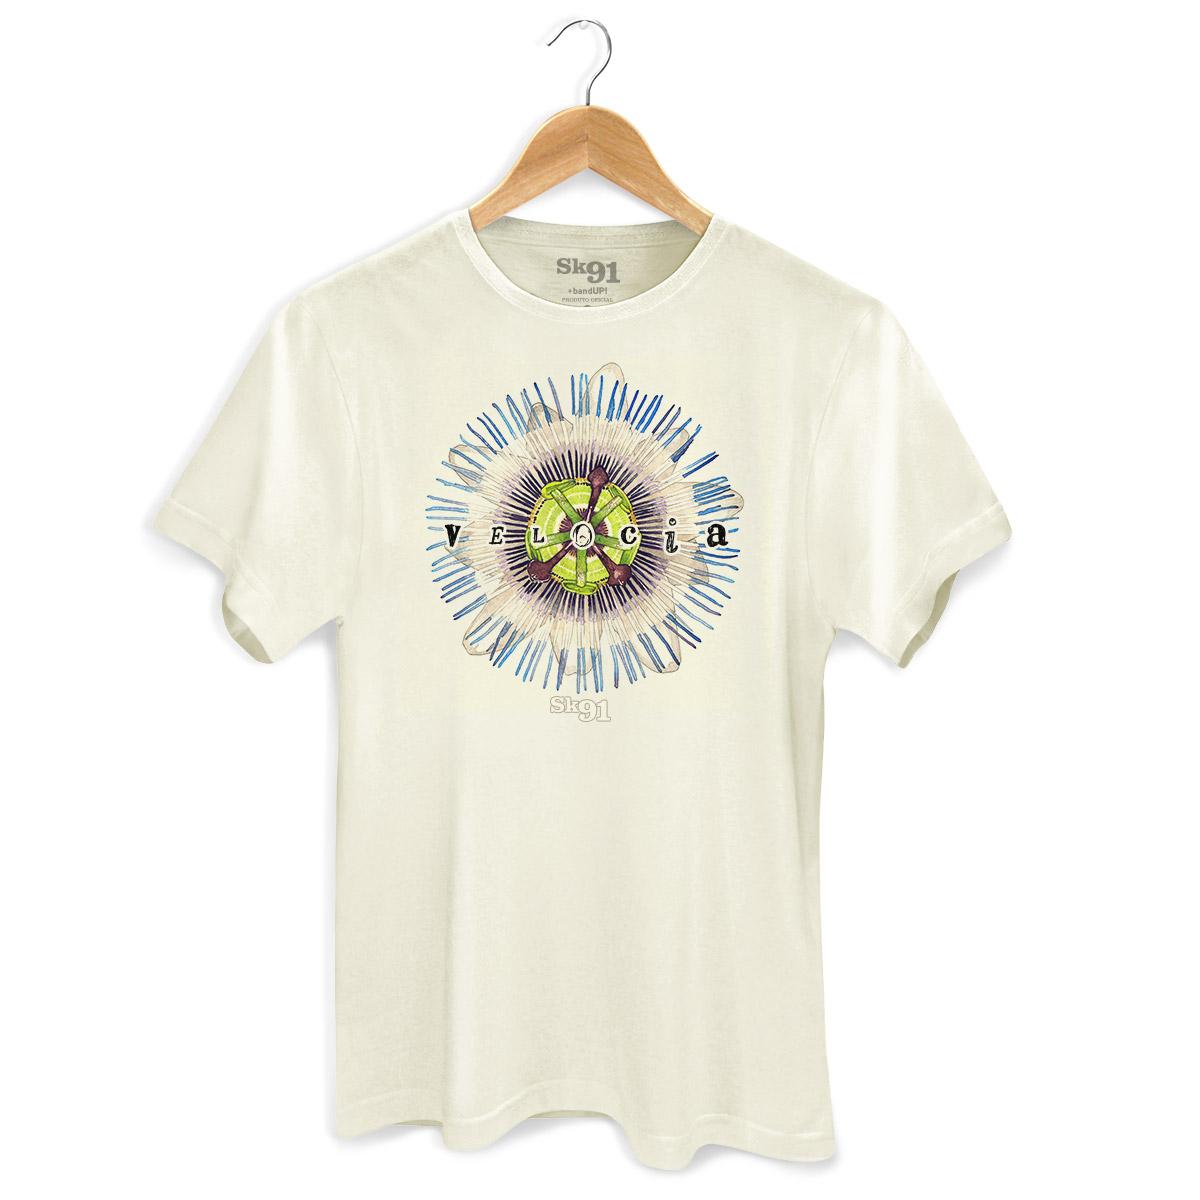 Camiseta Masculina Sk91 Velocia Colors